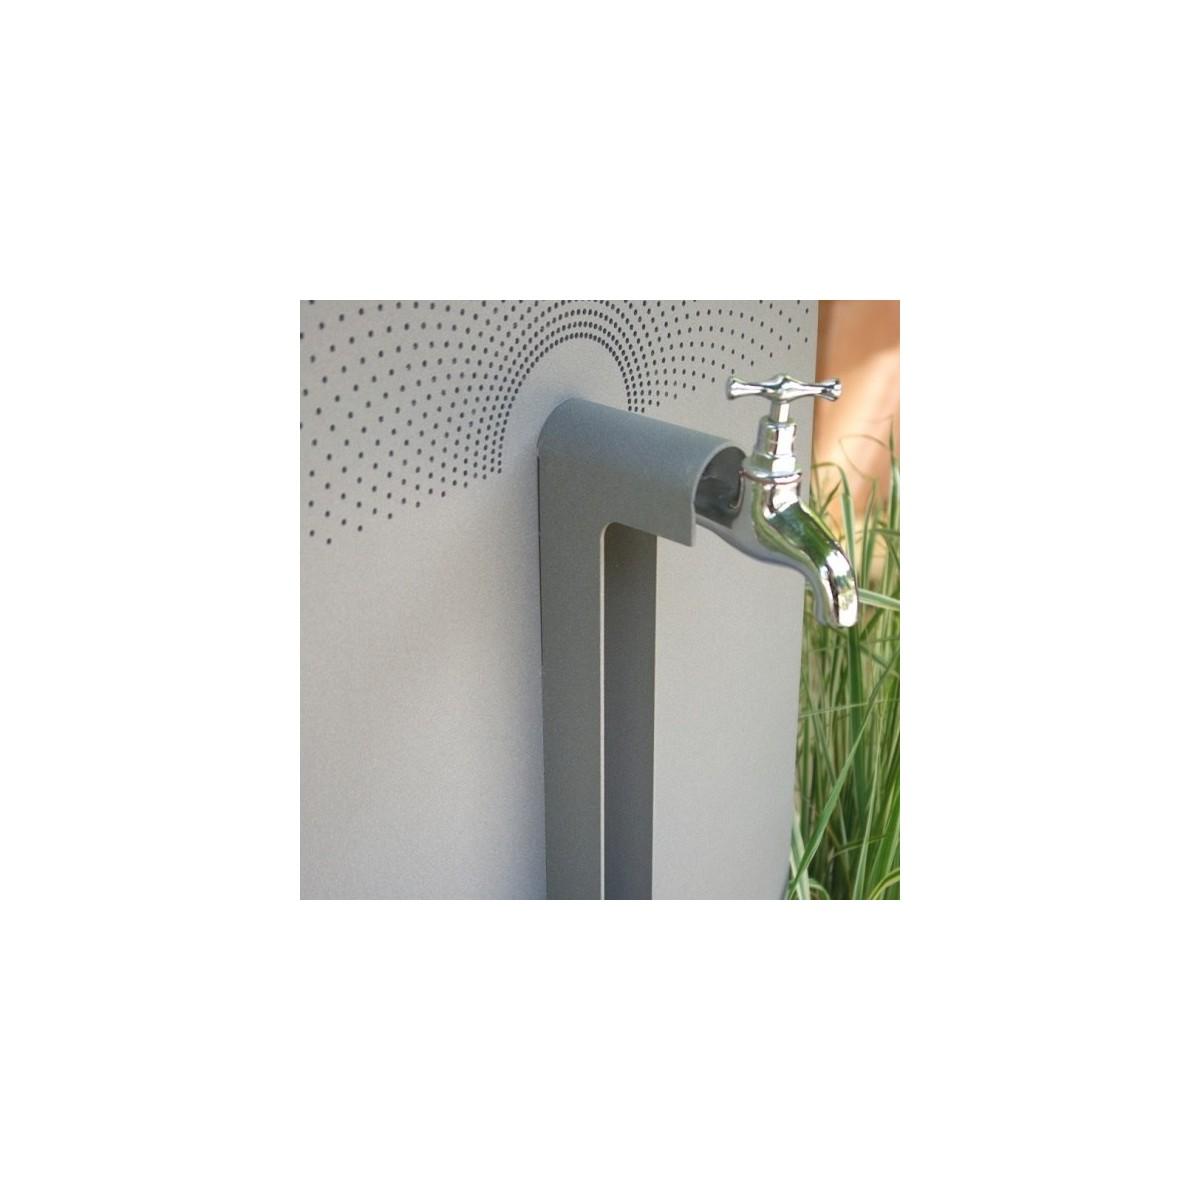 Robinet fontaine castorama maison design - Castorama jardin robinet ...